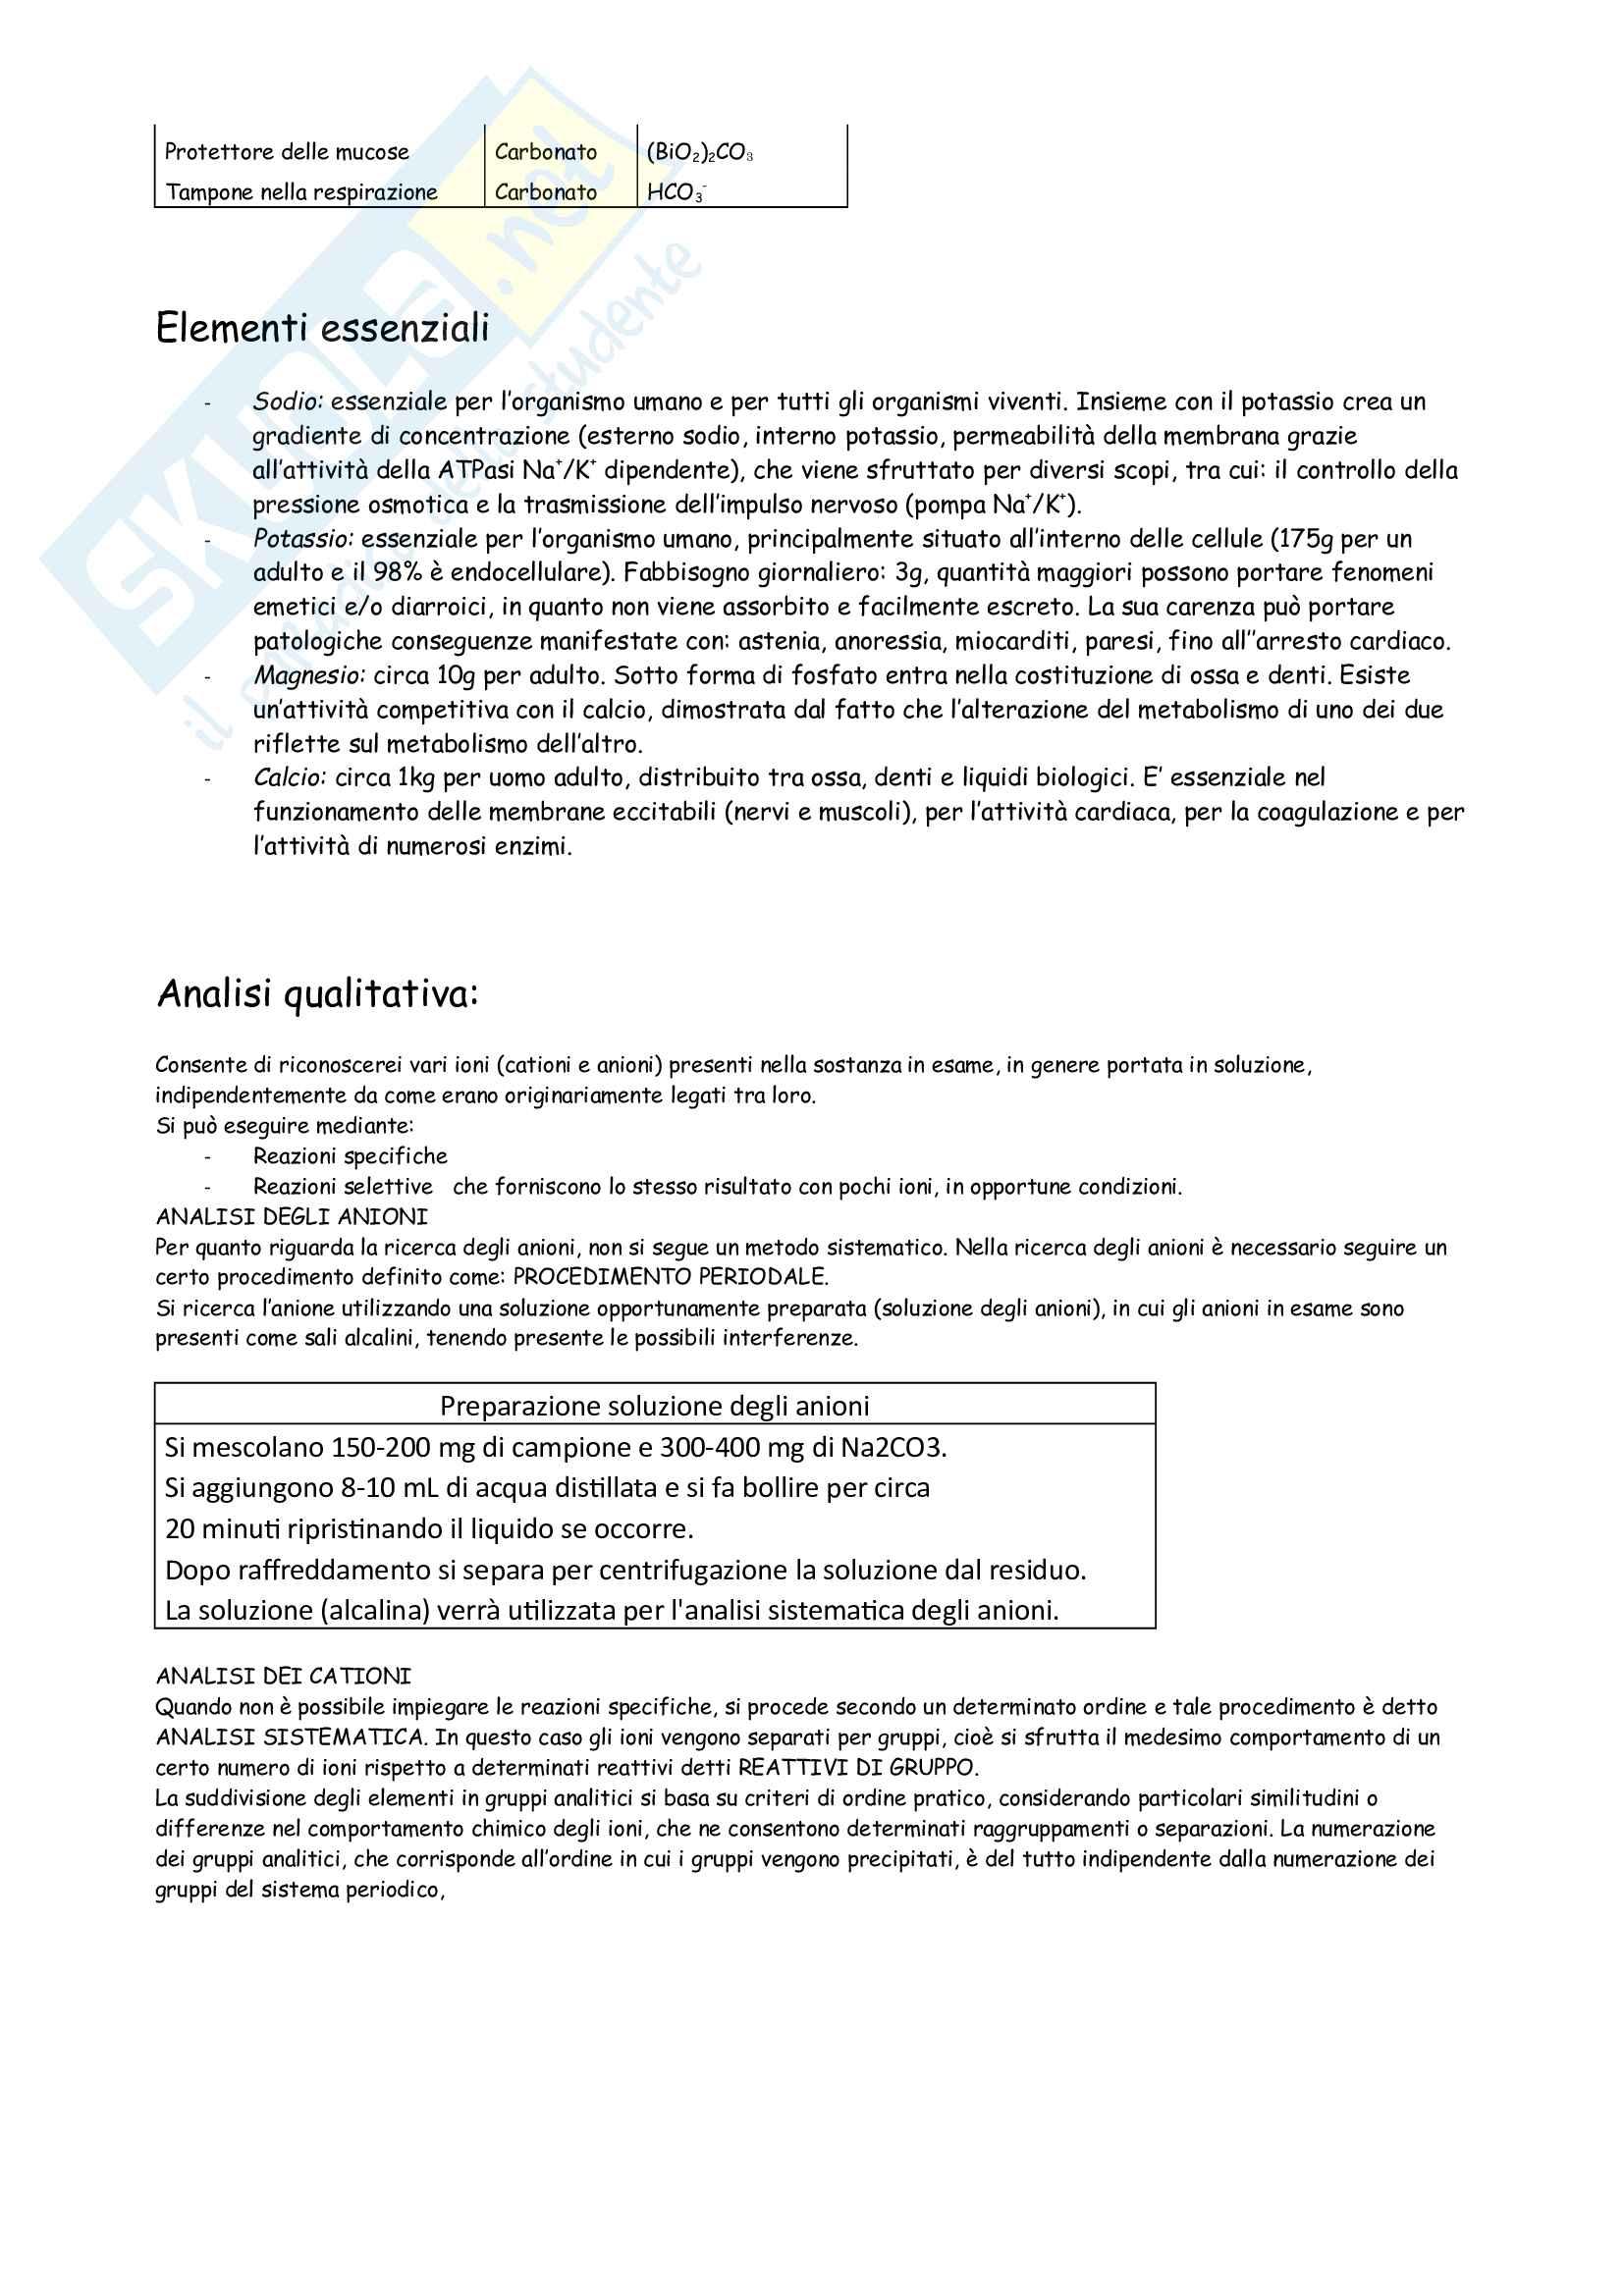 Appunti Lab. Analisi Qualitativa Pag. 6